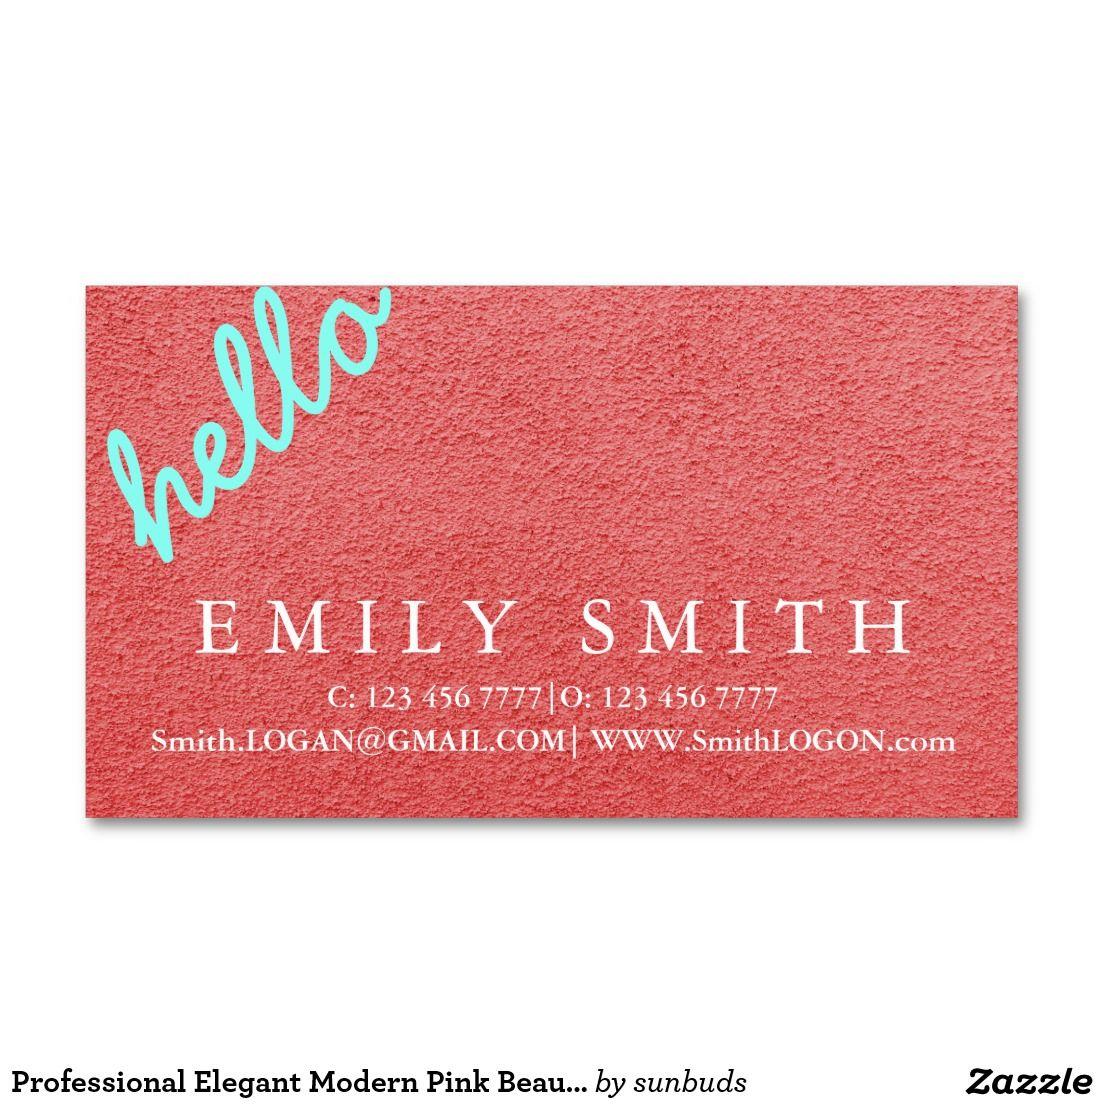 Professional Elegant Modern Pink Beautician Business Card